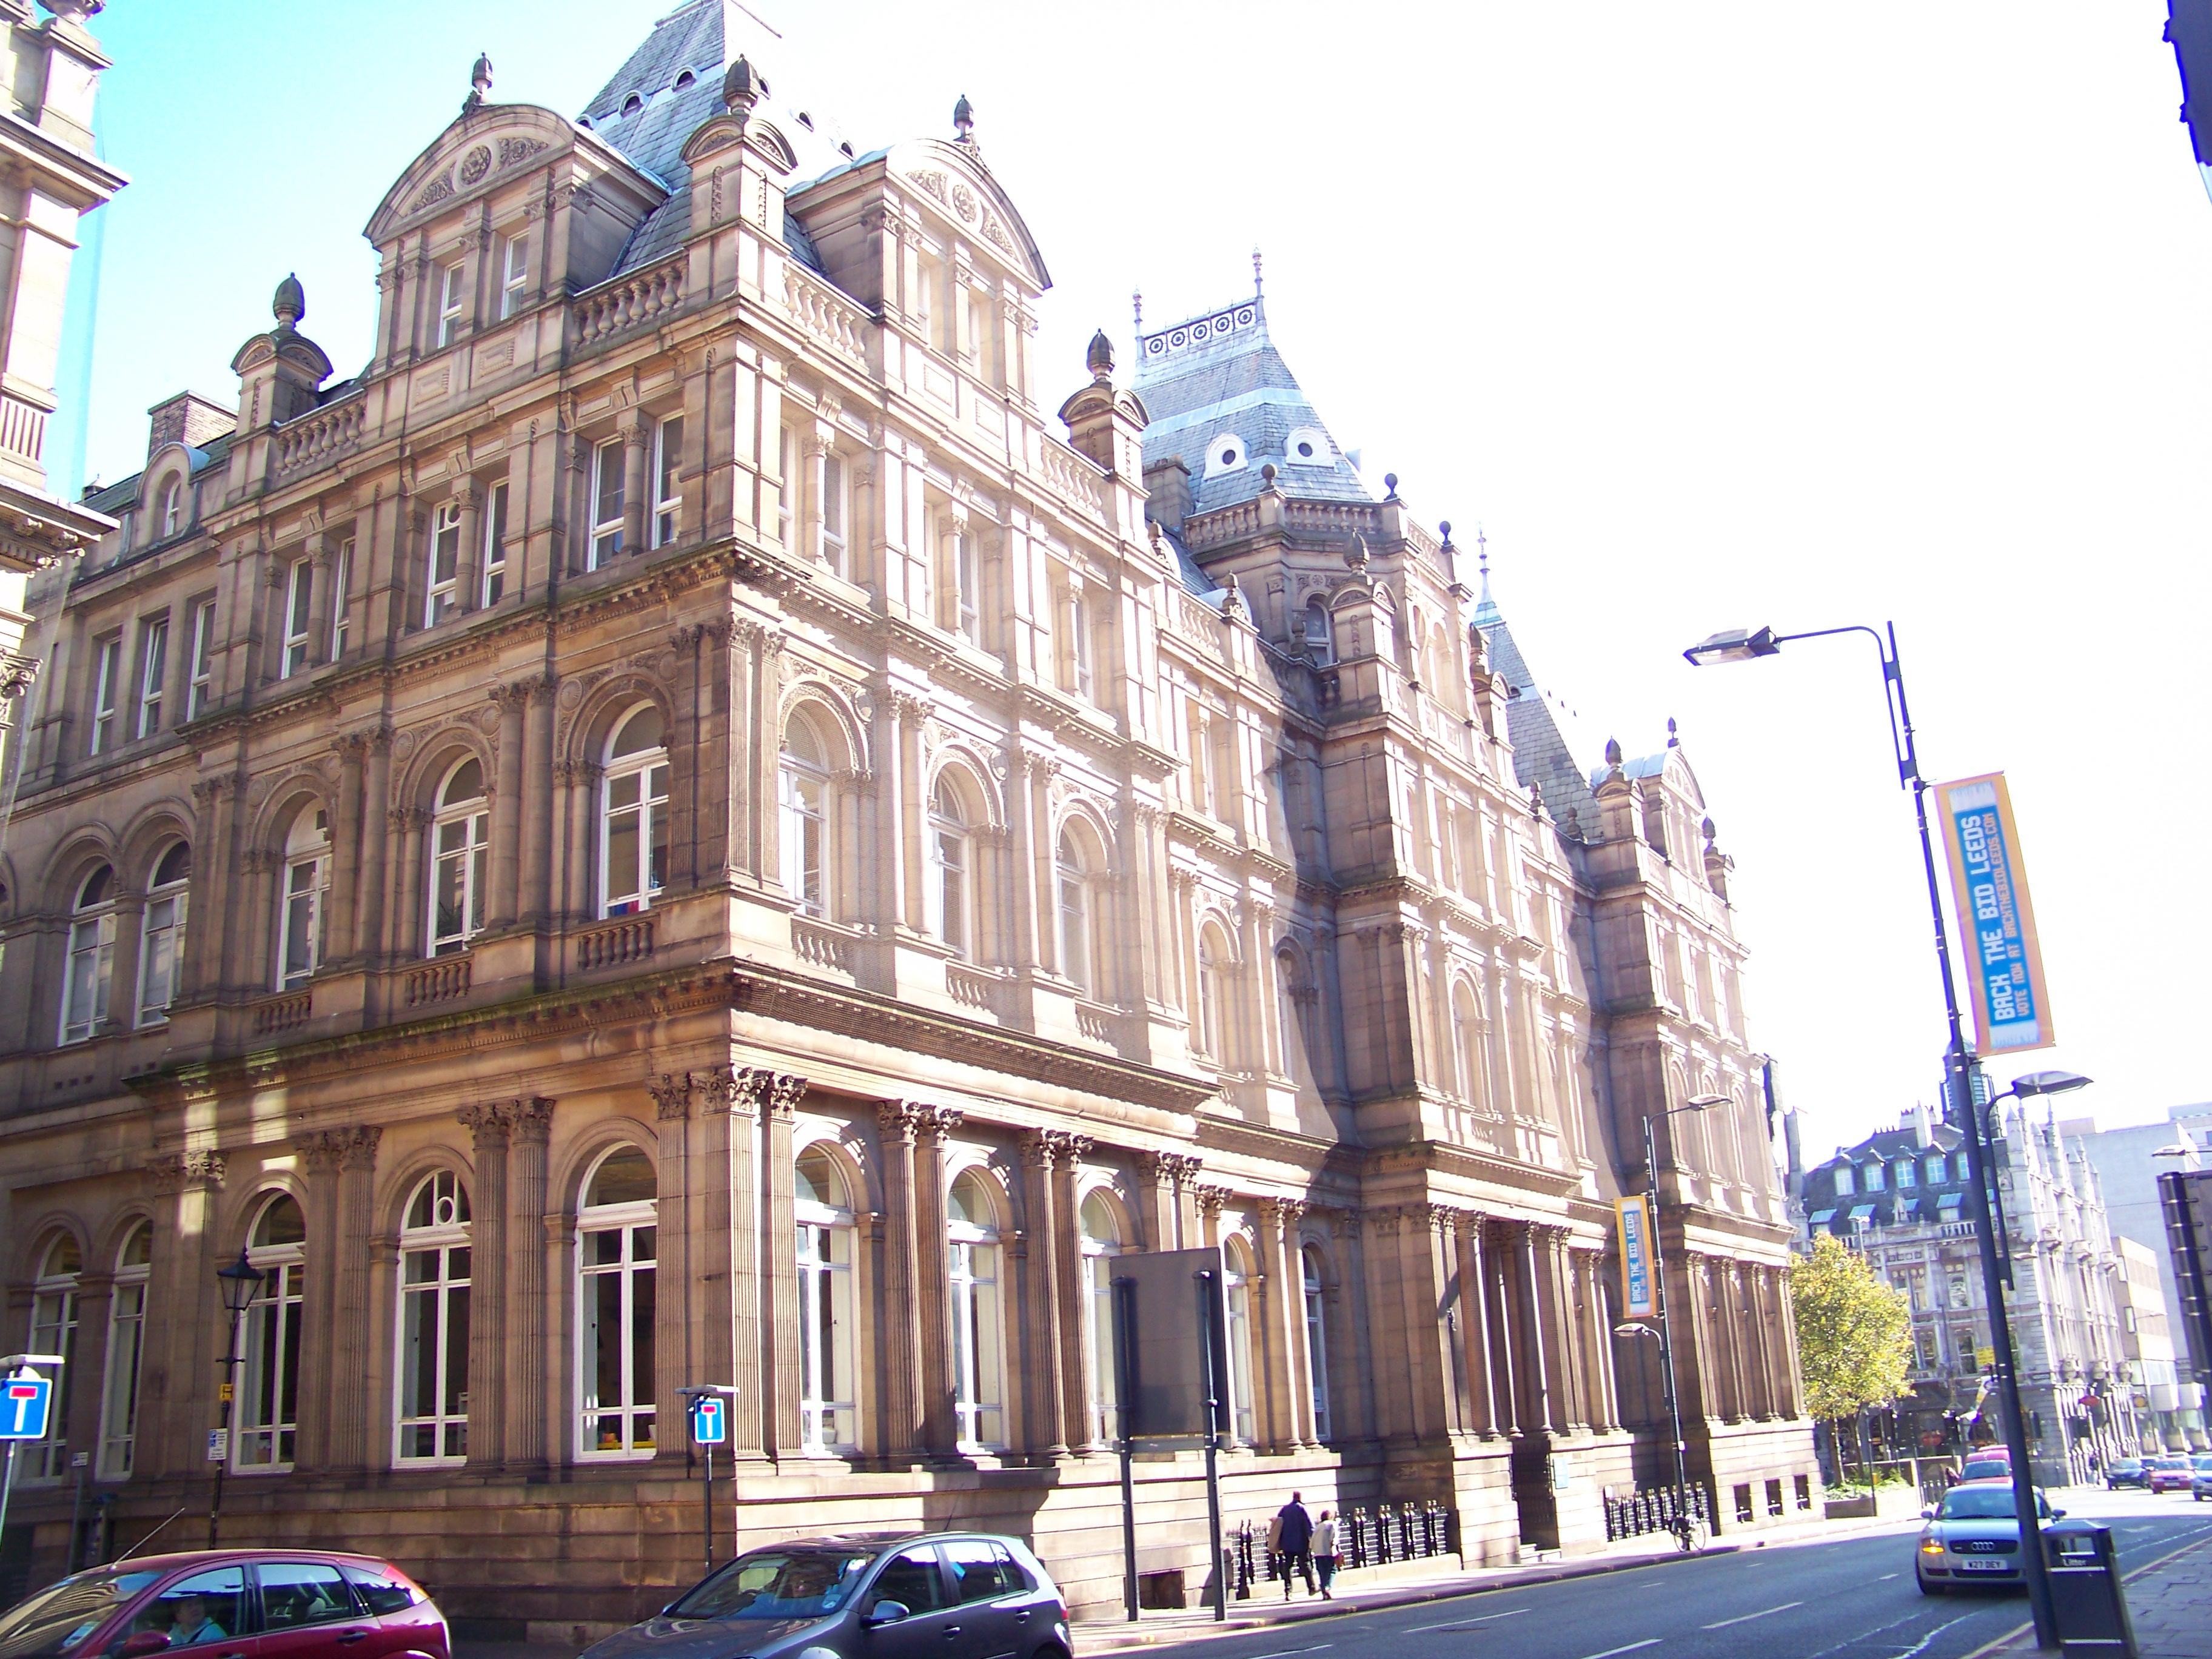 Biblioteka w Leeds (fot. Mtaylor848 / Wikimedia.org / CC BY-SA 3.0)